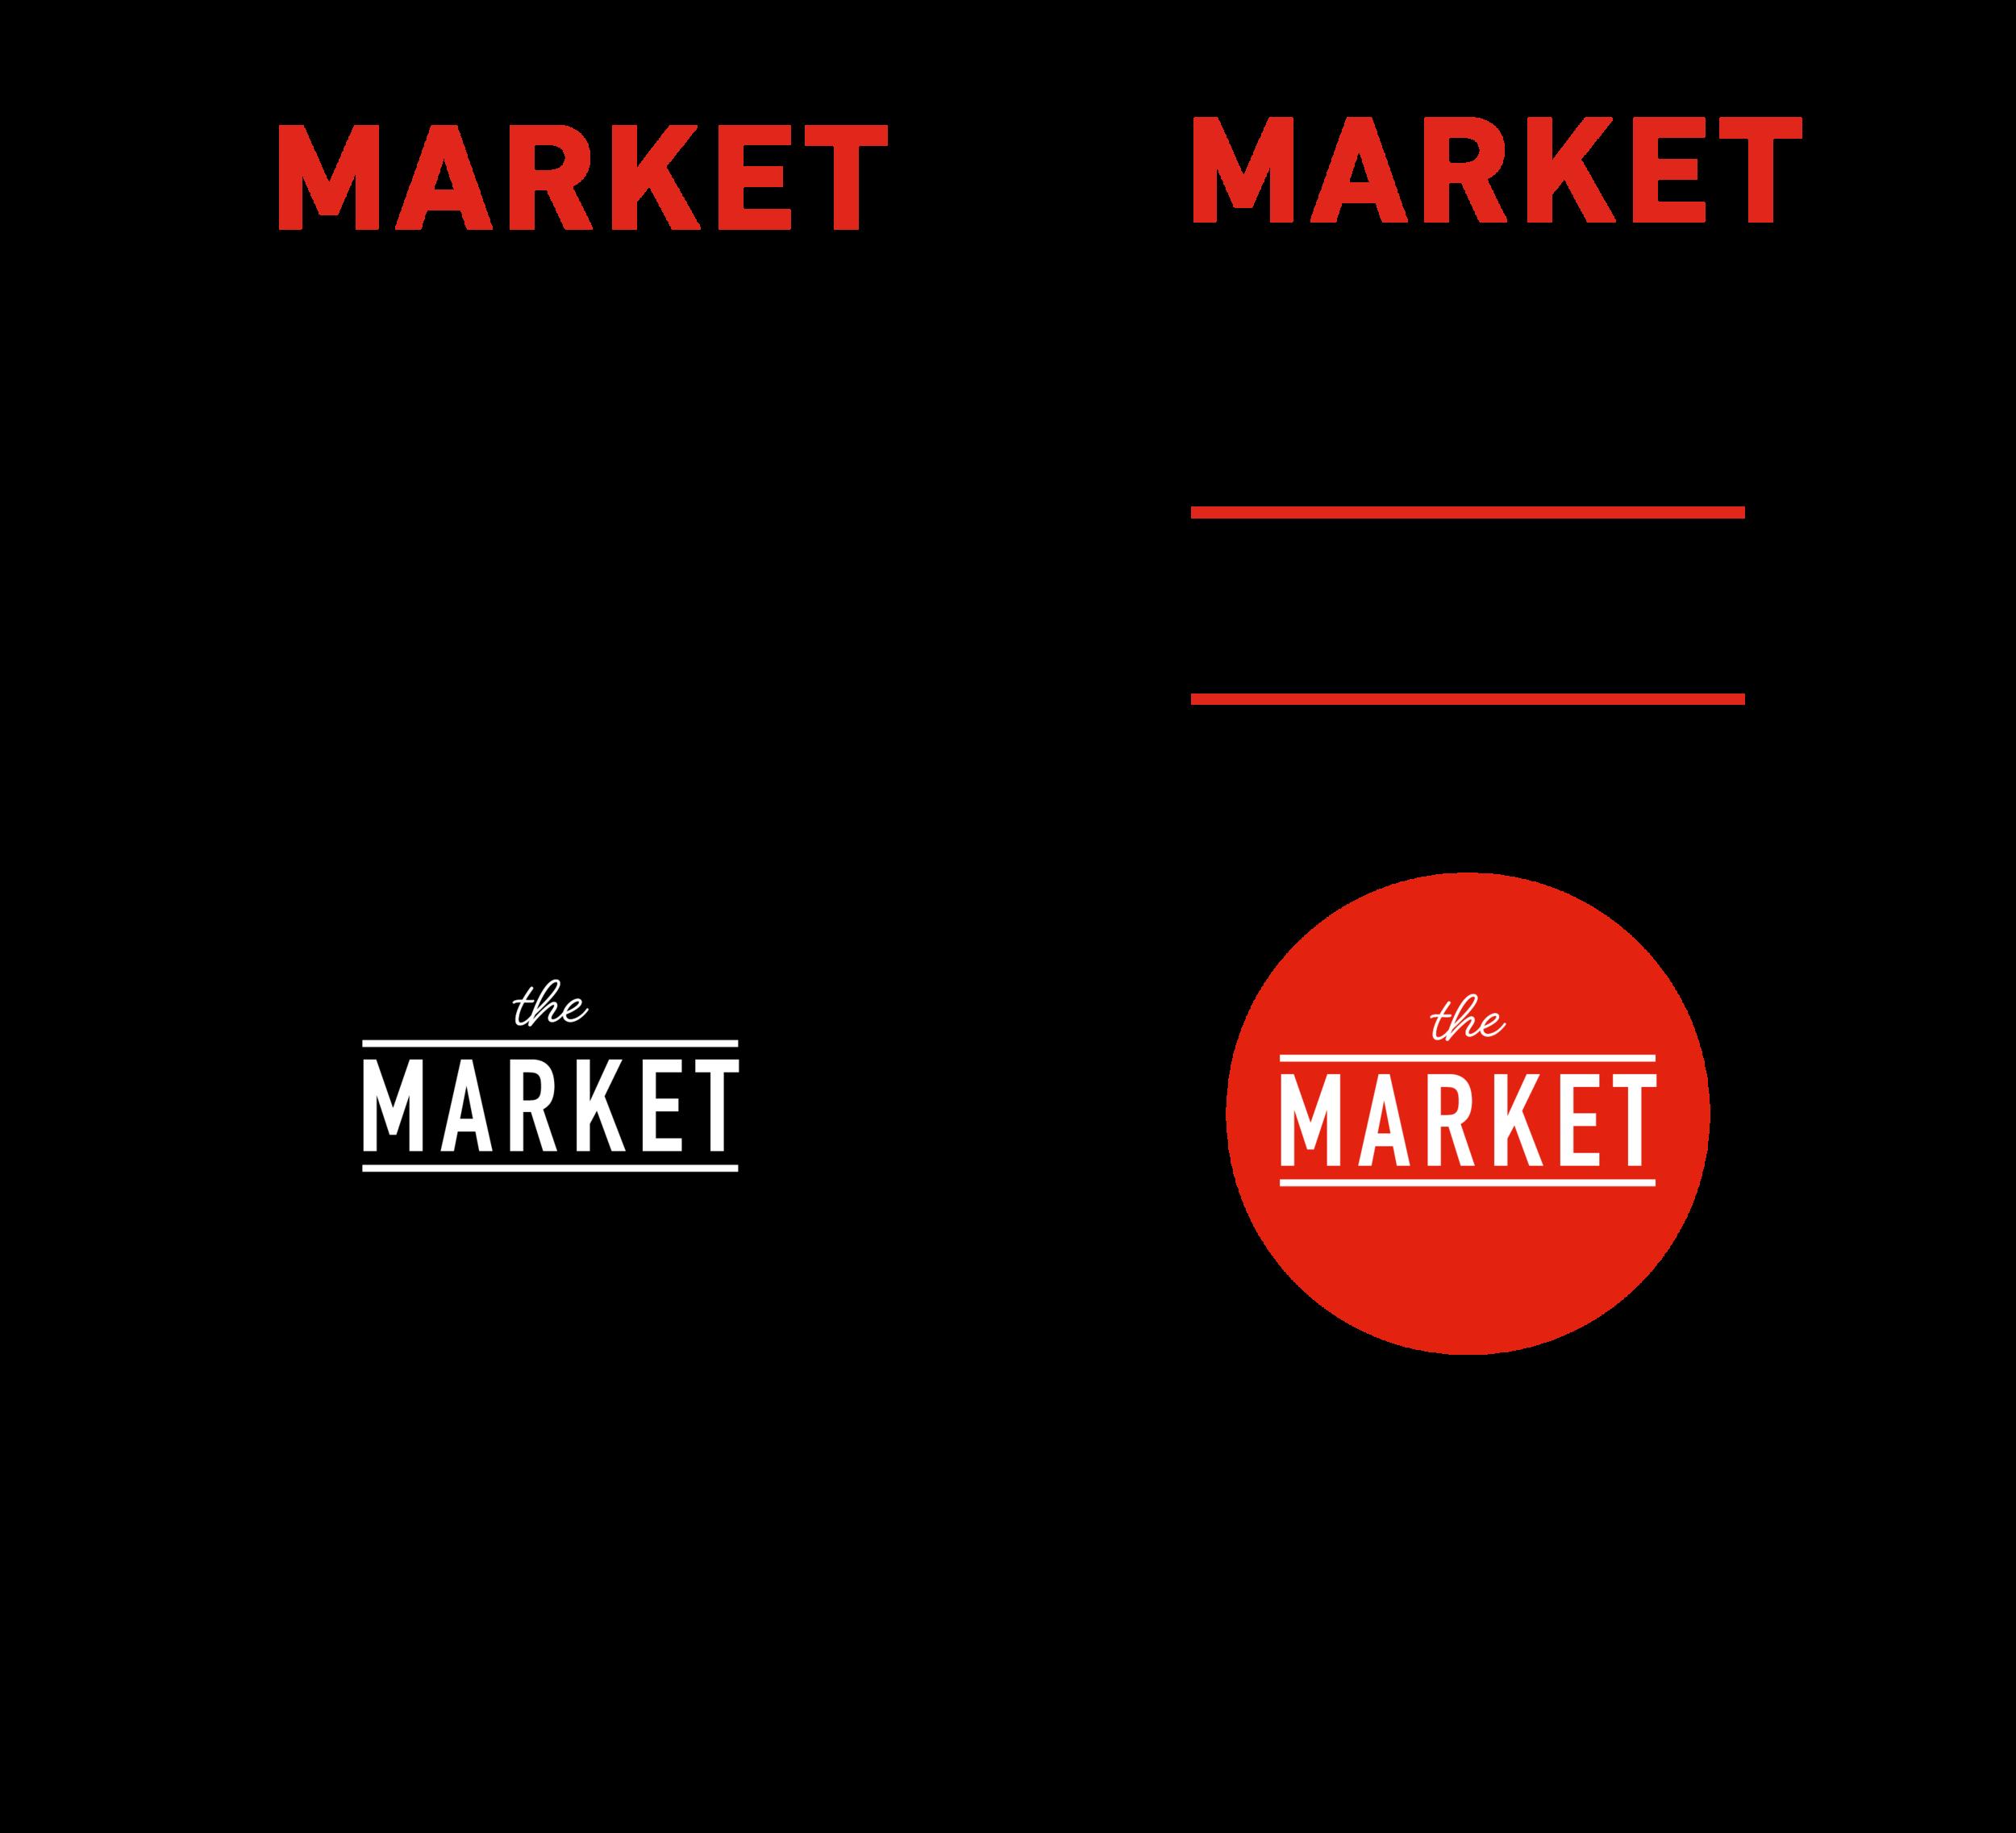 TheMarket_Logo-Drafts.png